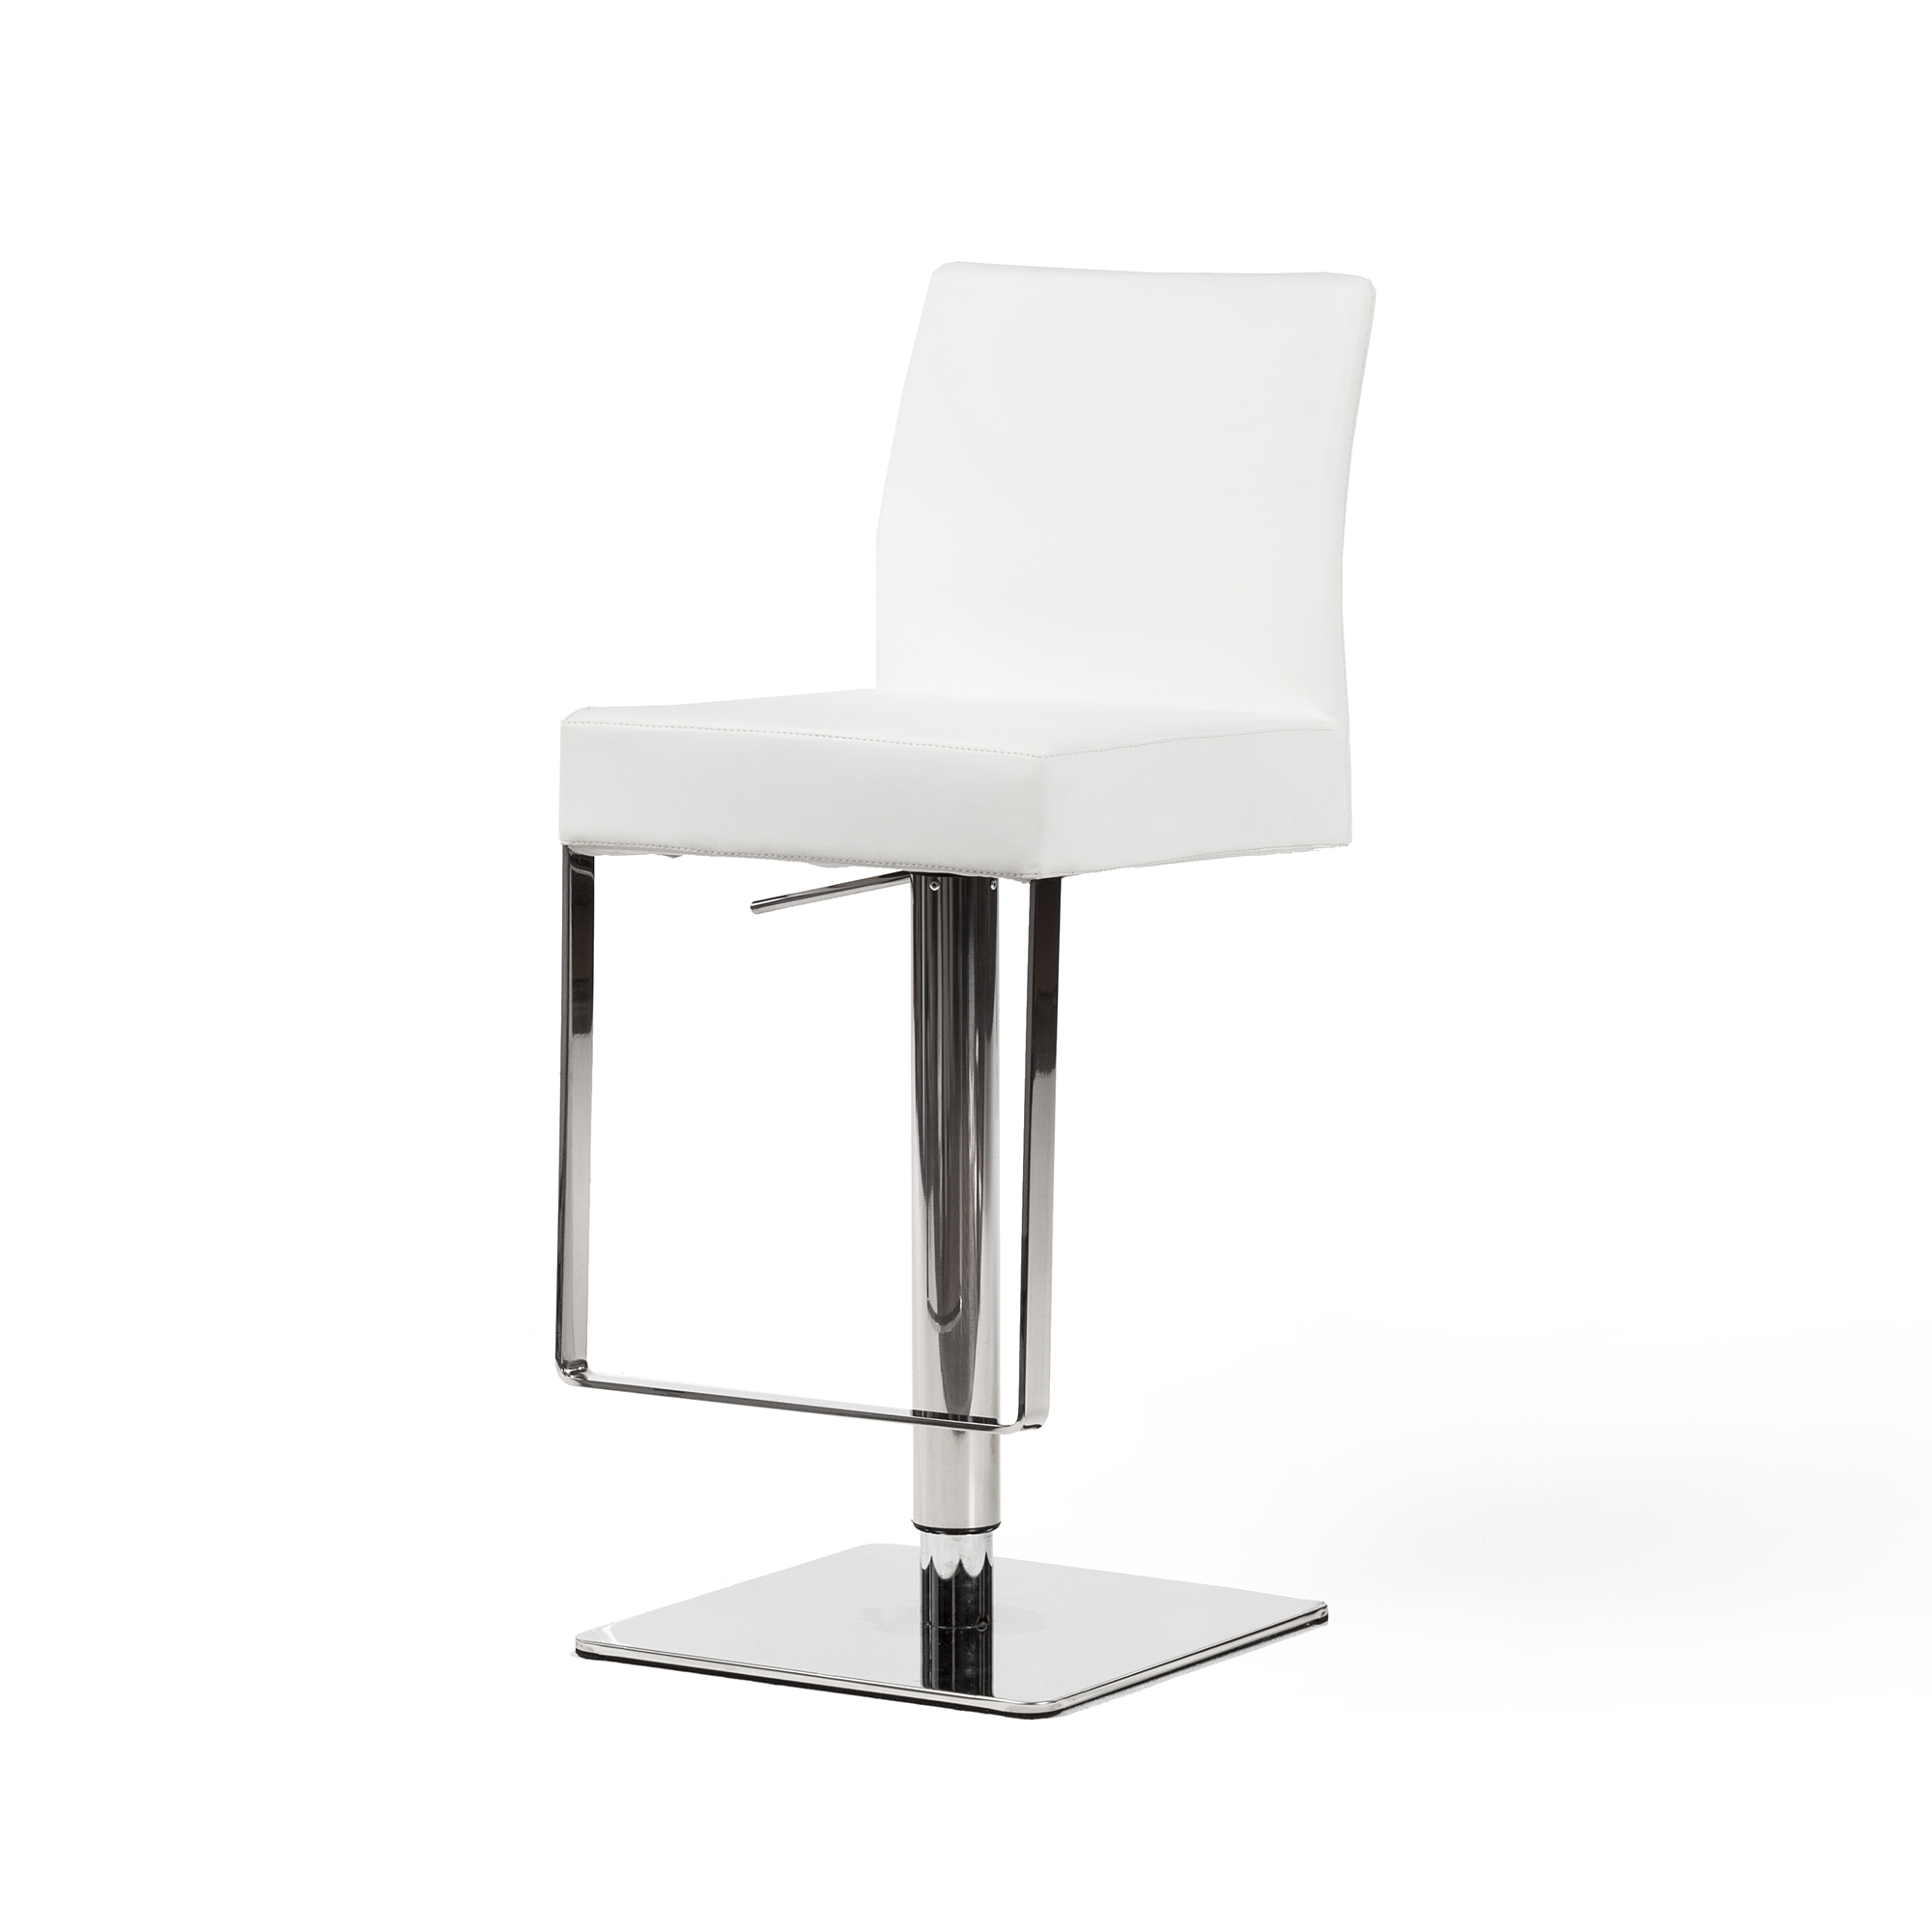 Phenomenal Hydraulic Adjustable Counter Stool White Leather Theyellowbook Wood Chair Design Ideas Theyellowbookinfo